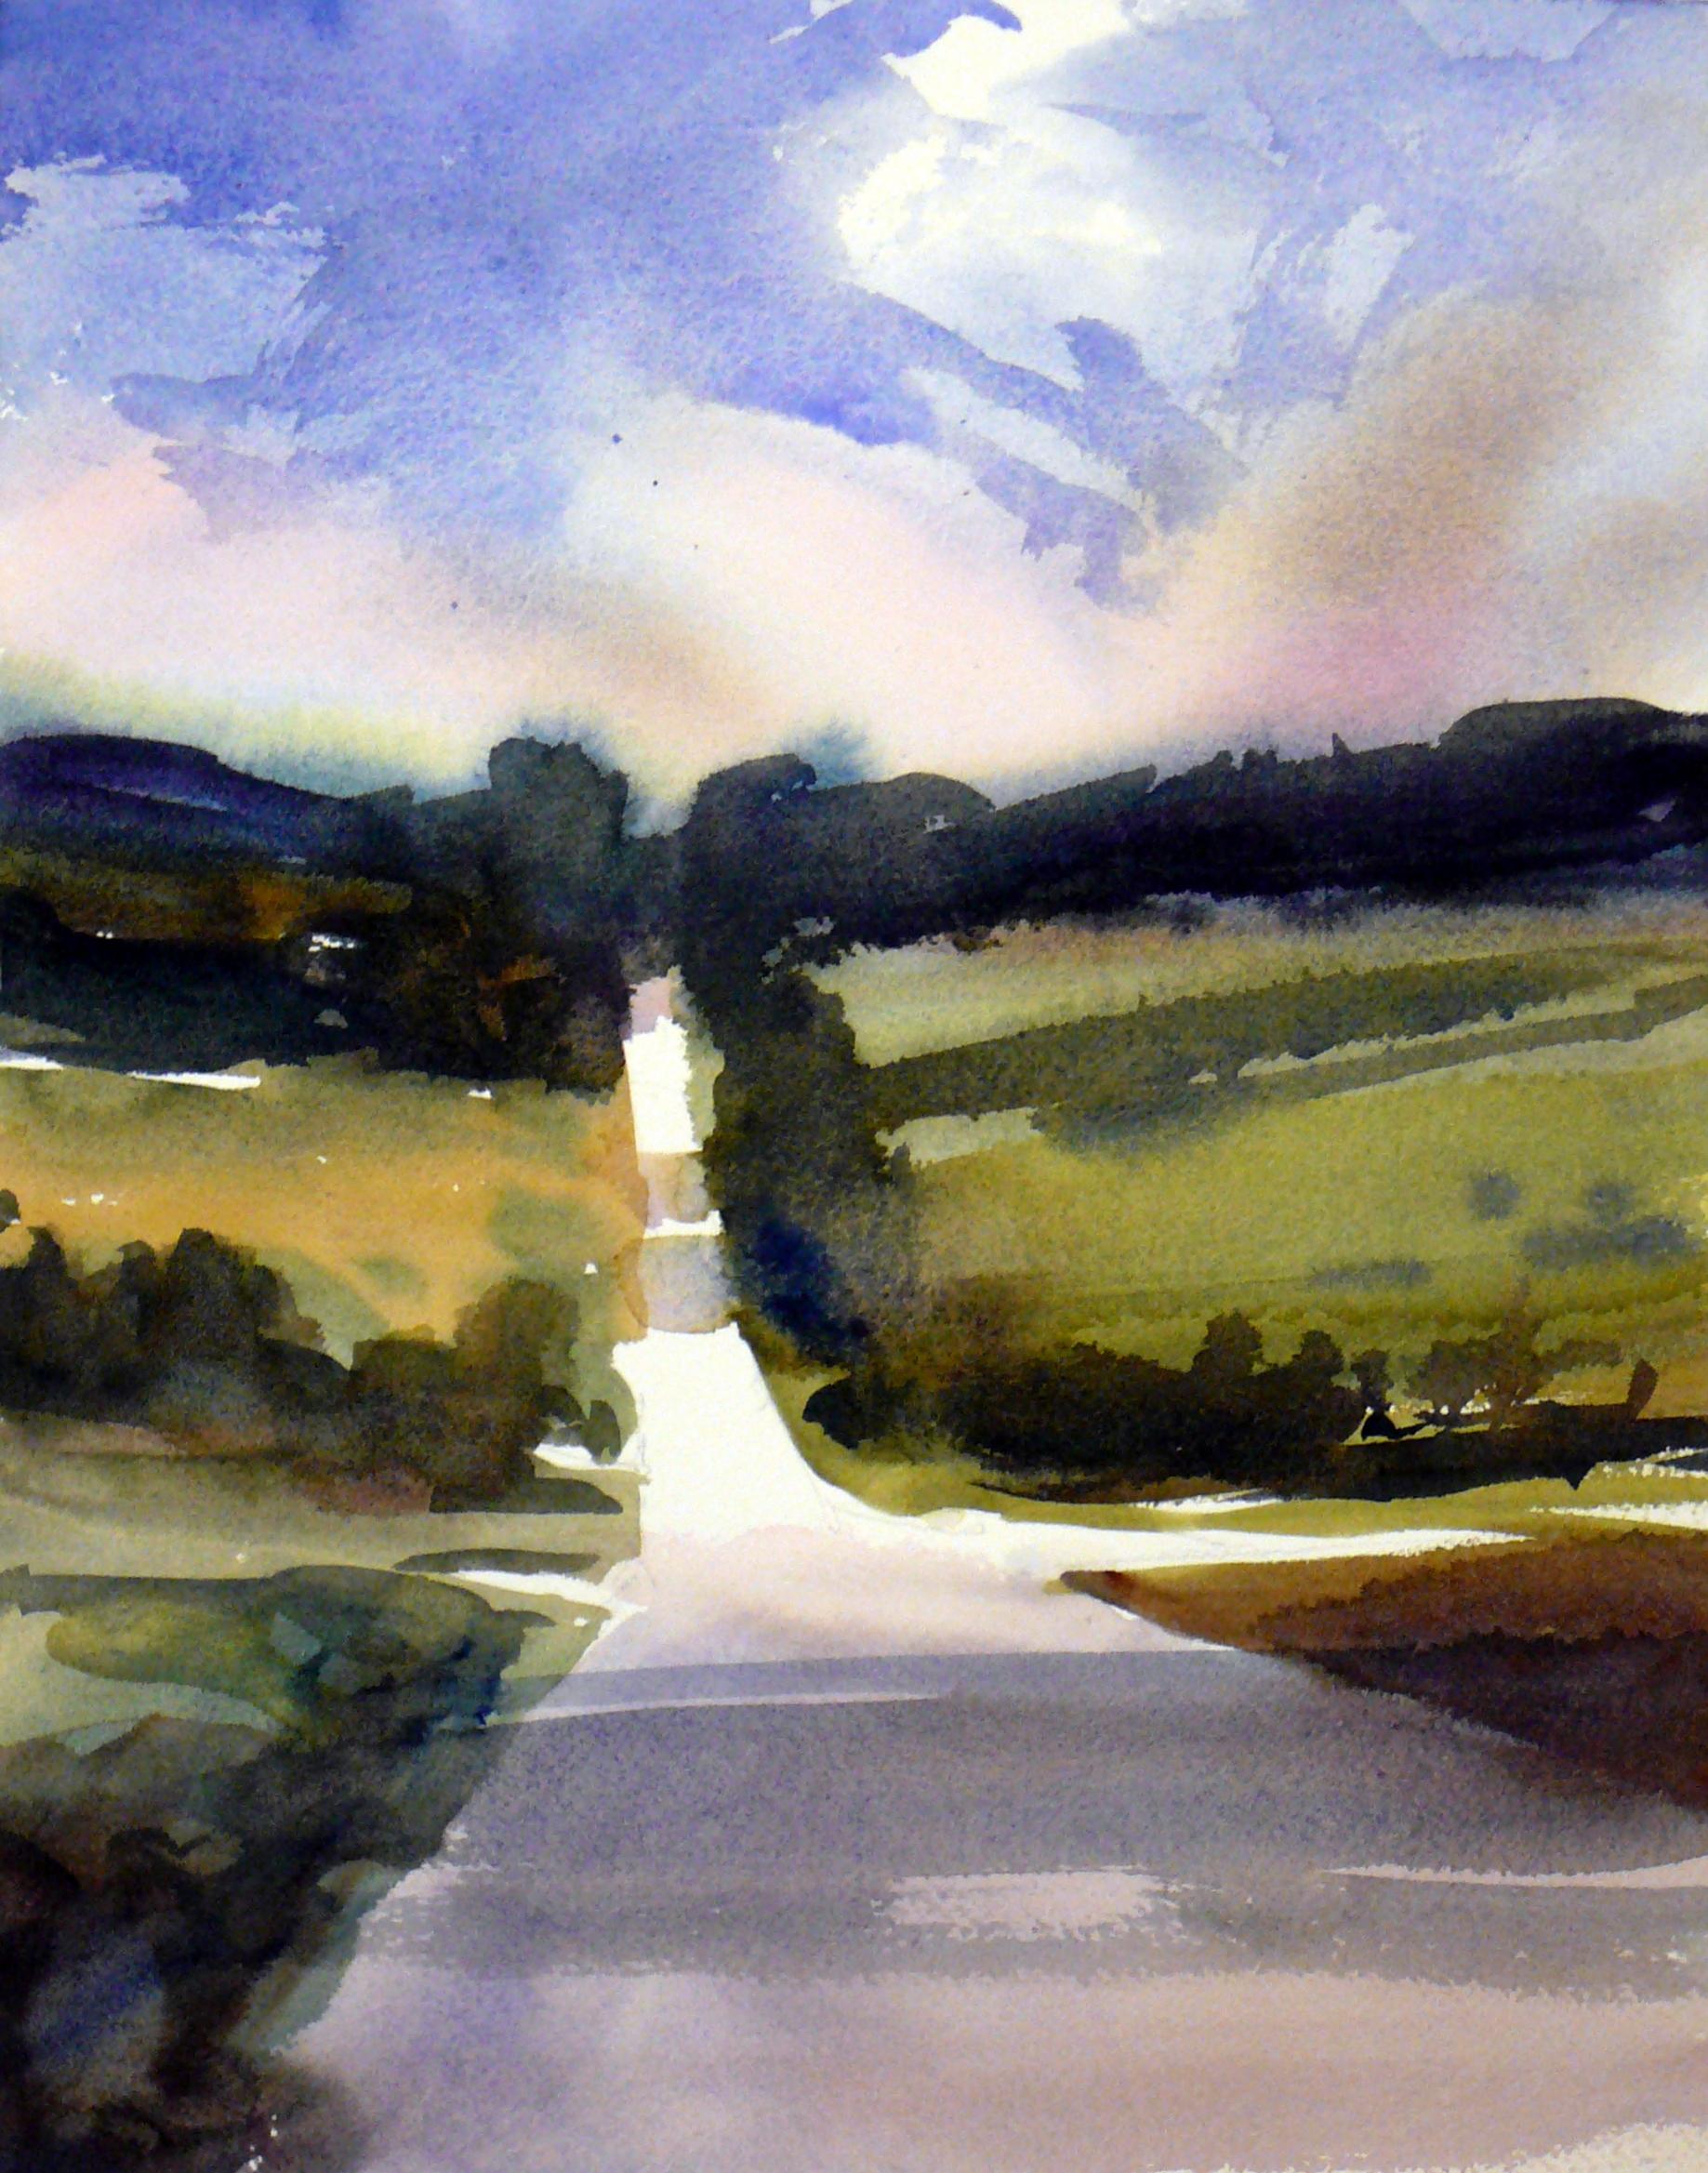 Near Bognor